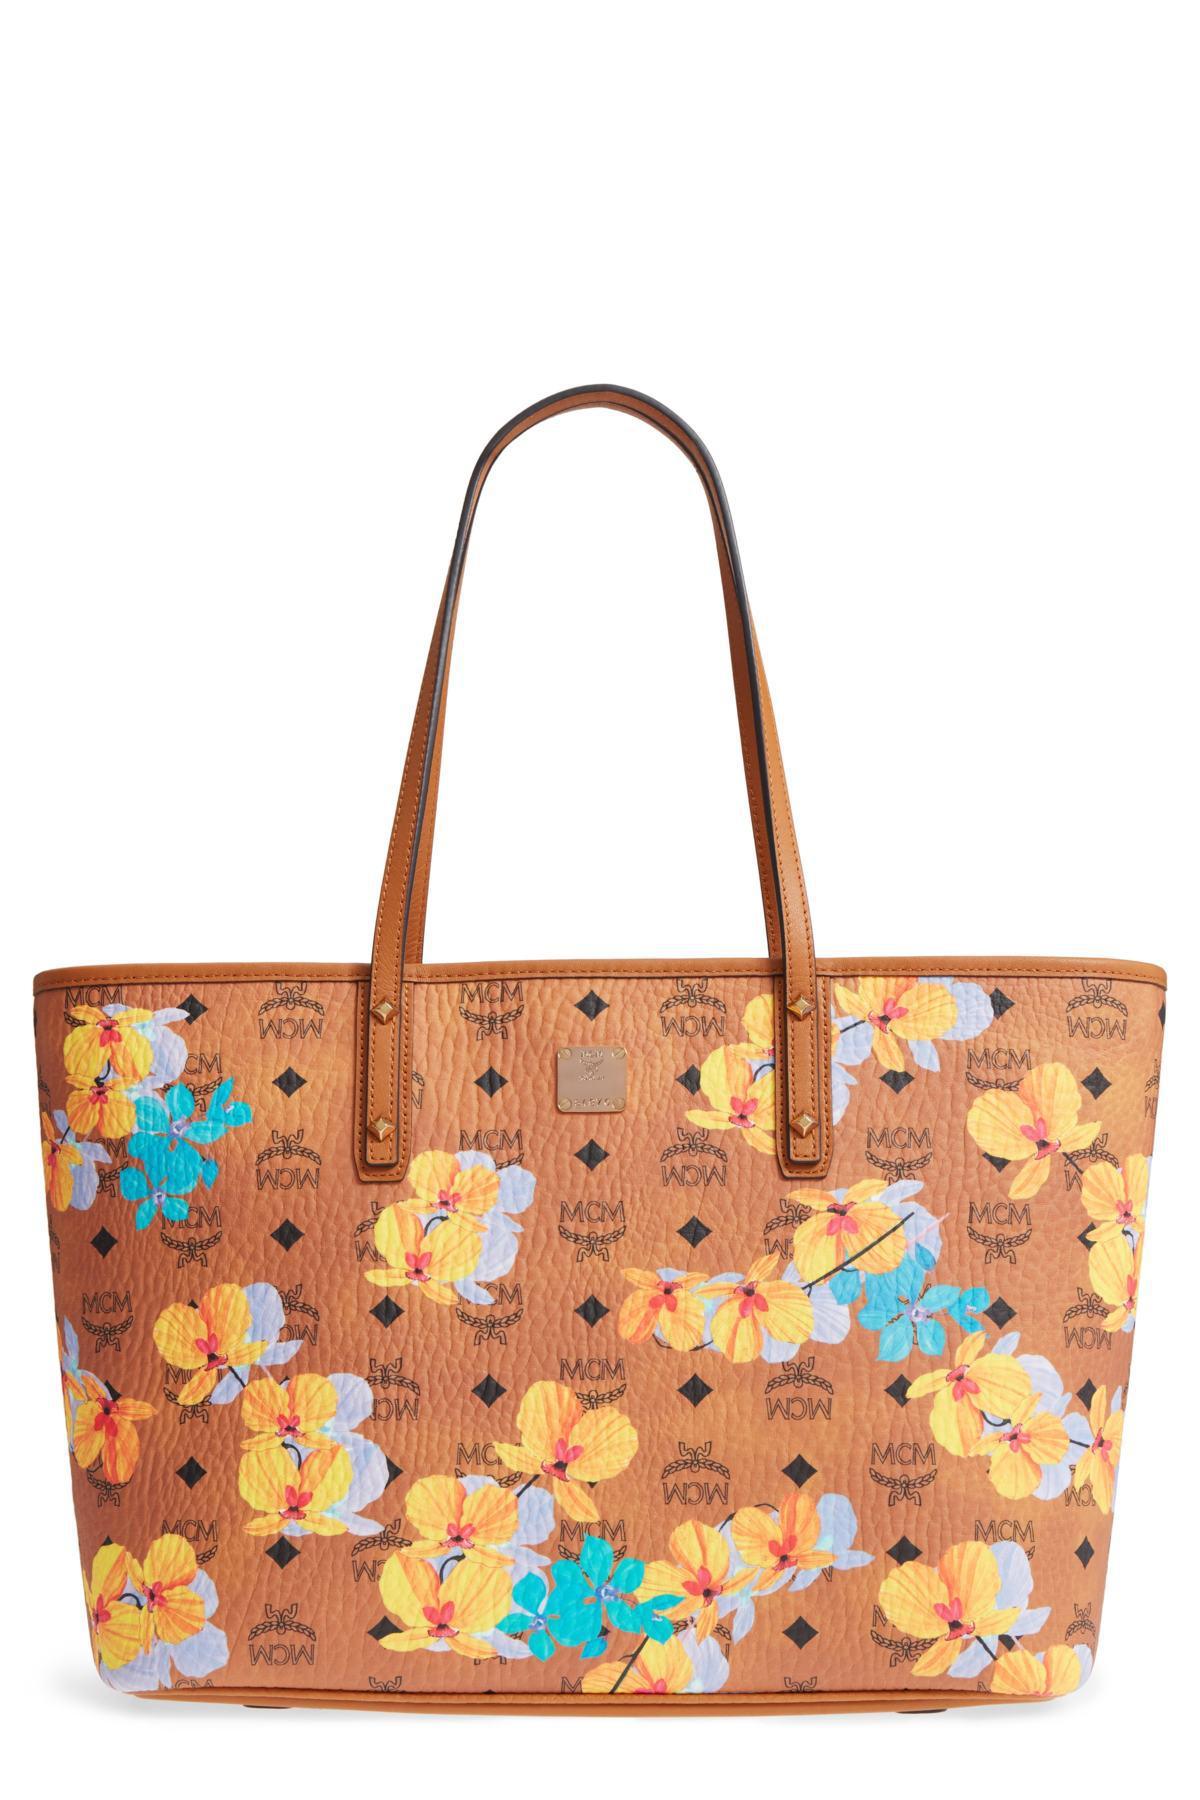 88ea094a56 Lyst - MCM Essential Visetos Floral Print Cognac Top Zip Medium Tote Bag